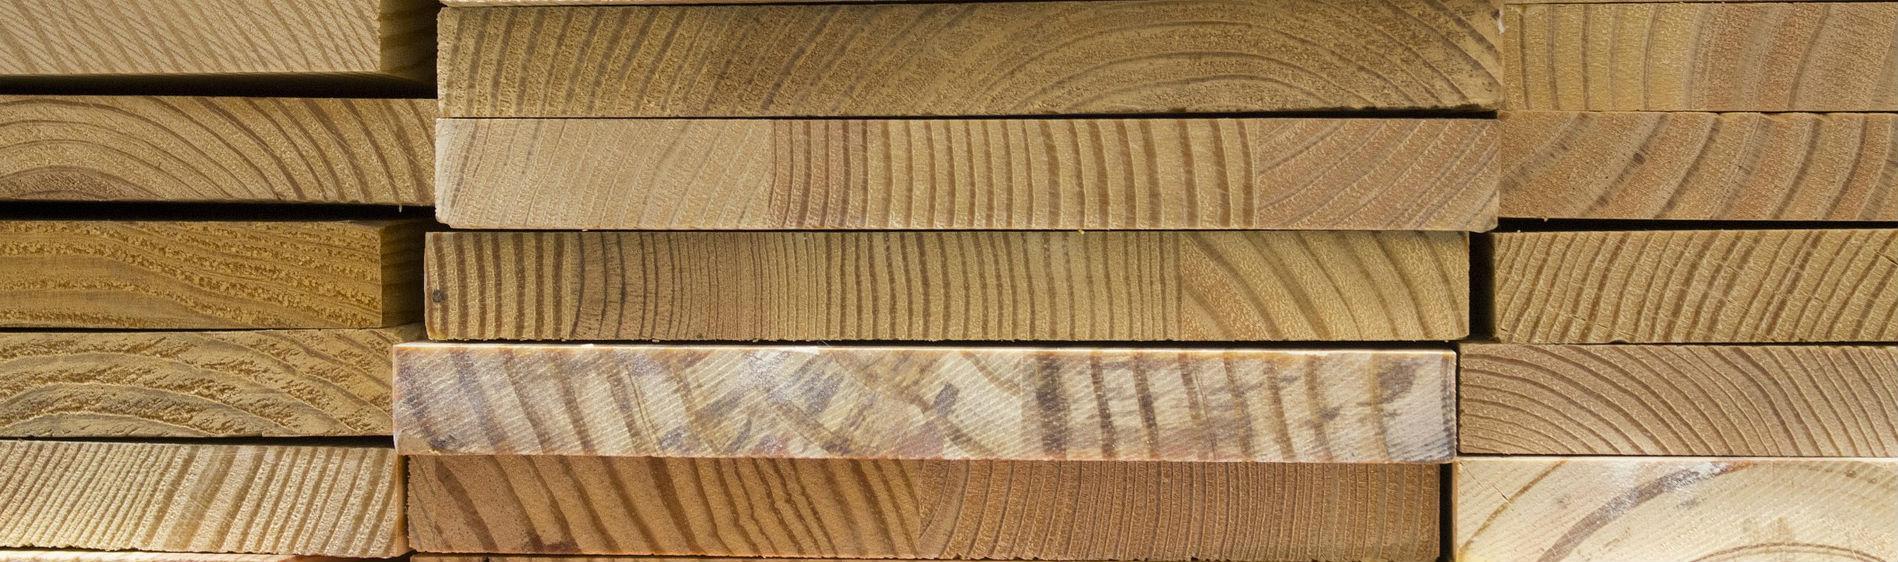 Splinterny FERRYWOOD - Trælast - Spærtræ, lægter m.m. - alt i træ UU23